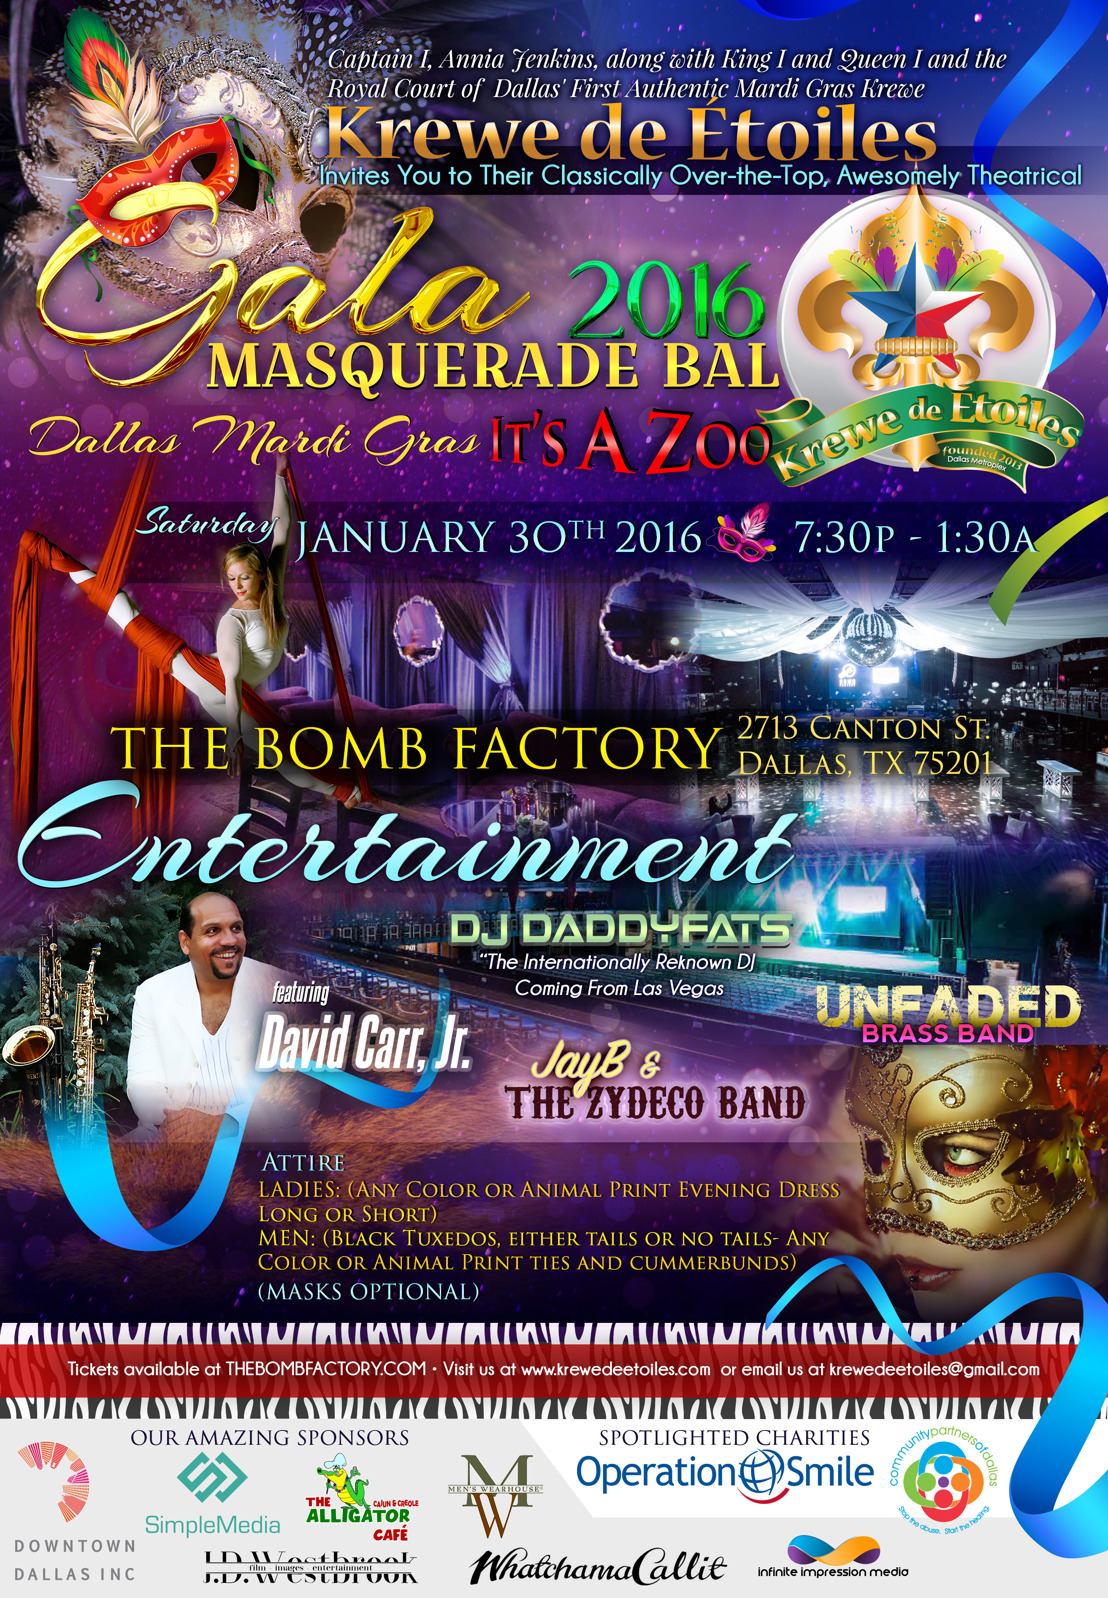 Krewe de Etoiles Presents the First Authentic Mardi Gras Gala Masquerade Bal in Dallas